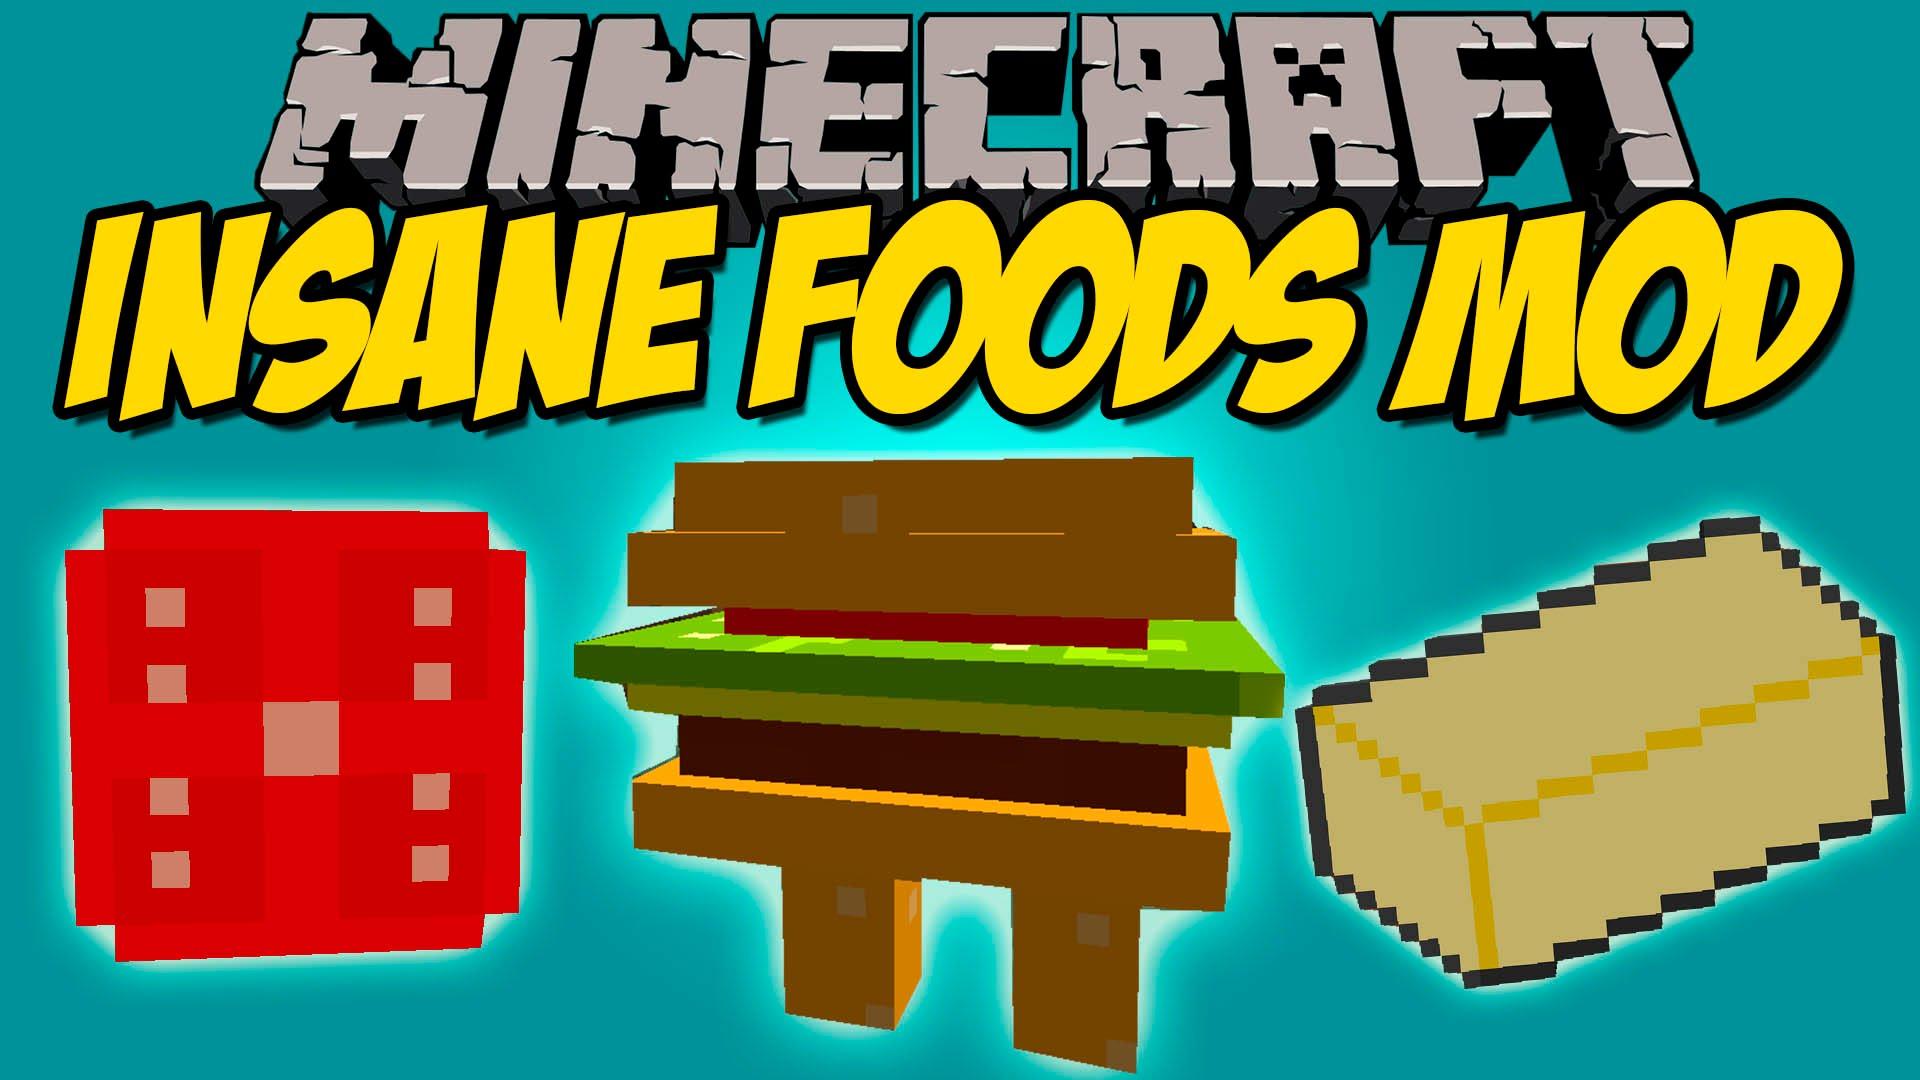 Insane Foods Mod